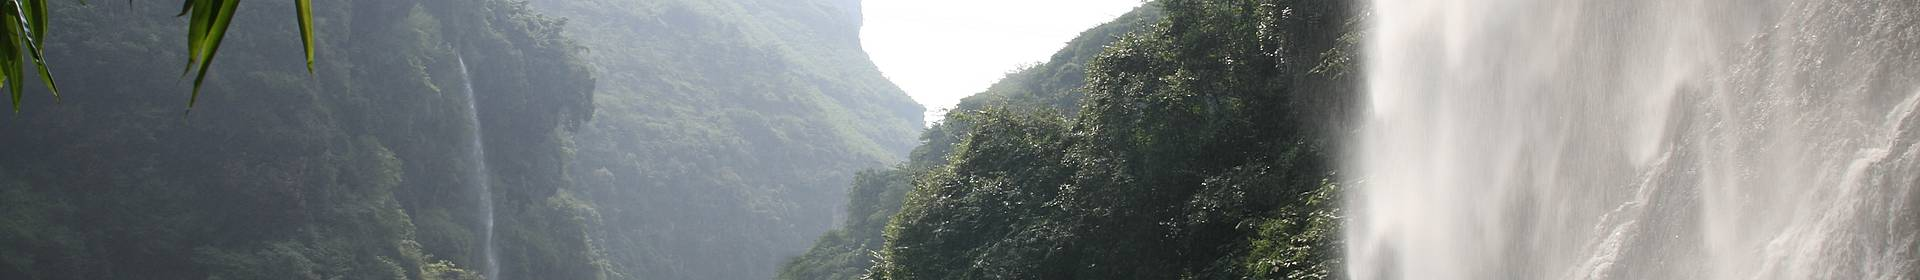 Rio Maling